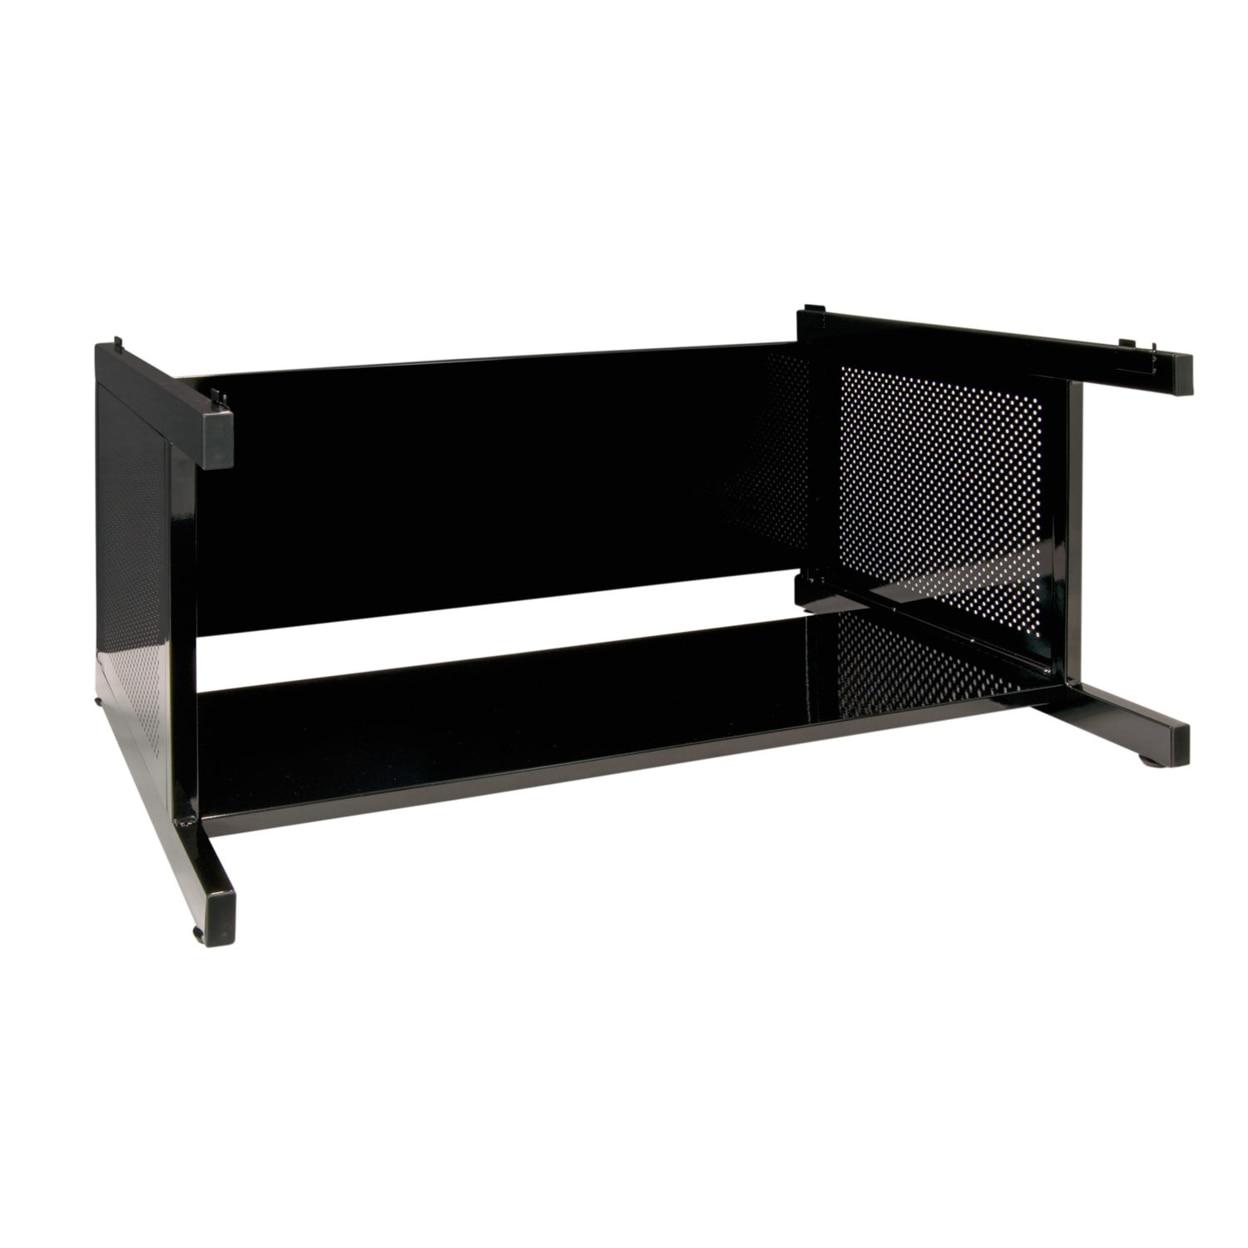 Studio Designs Home Office Flat File 40 Stand - Black